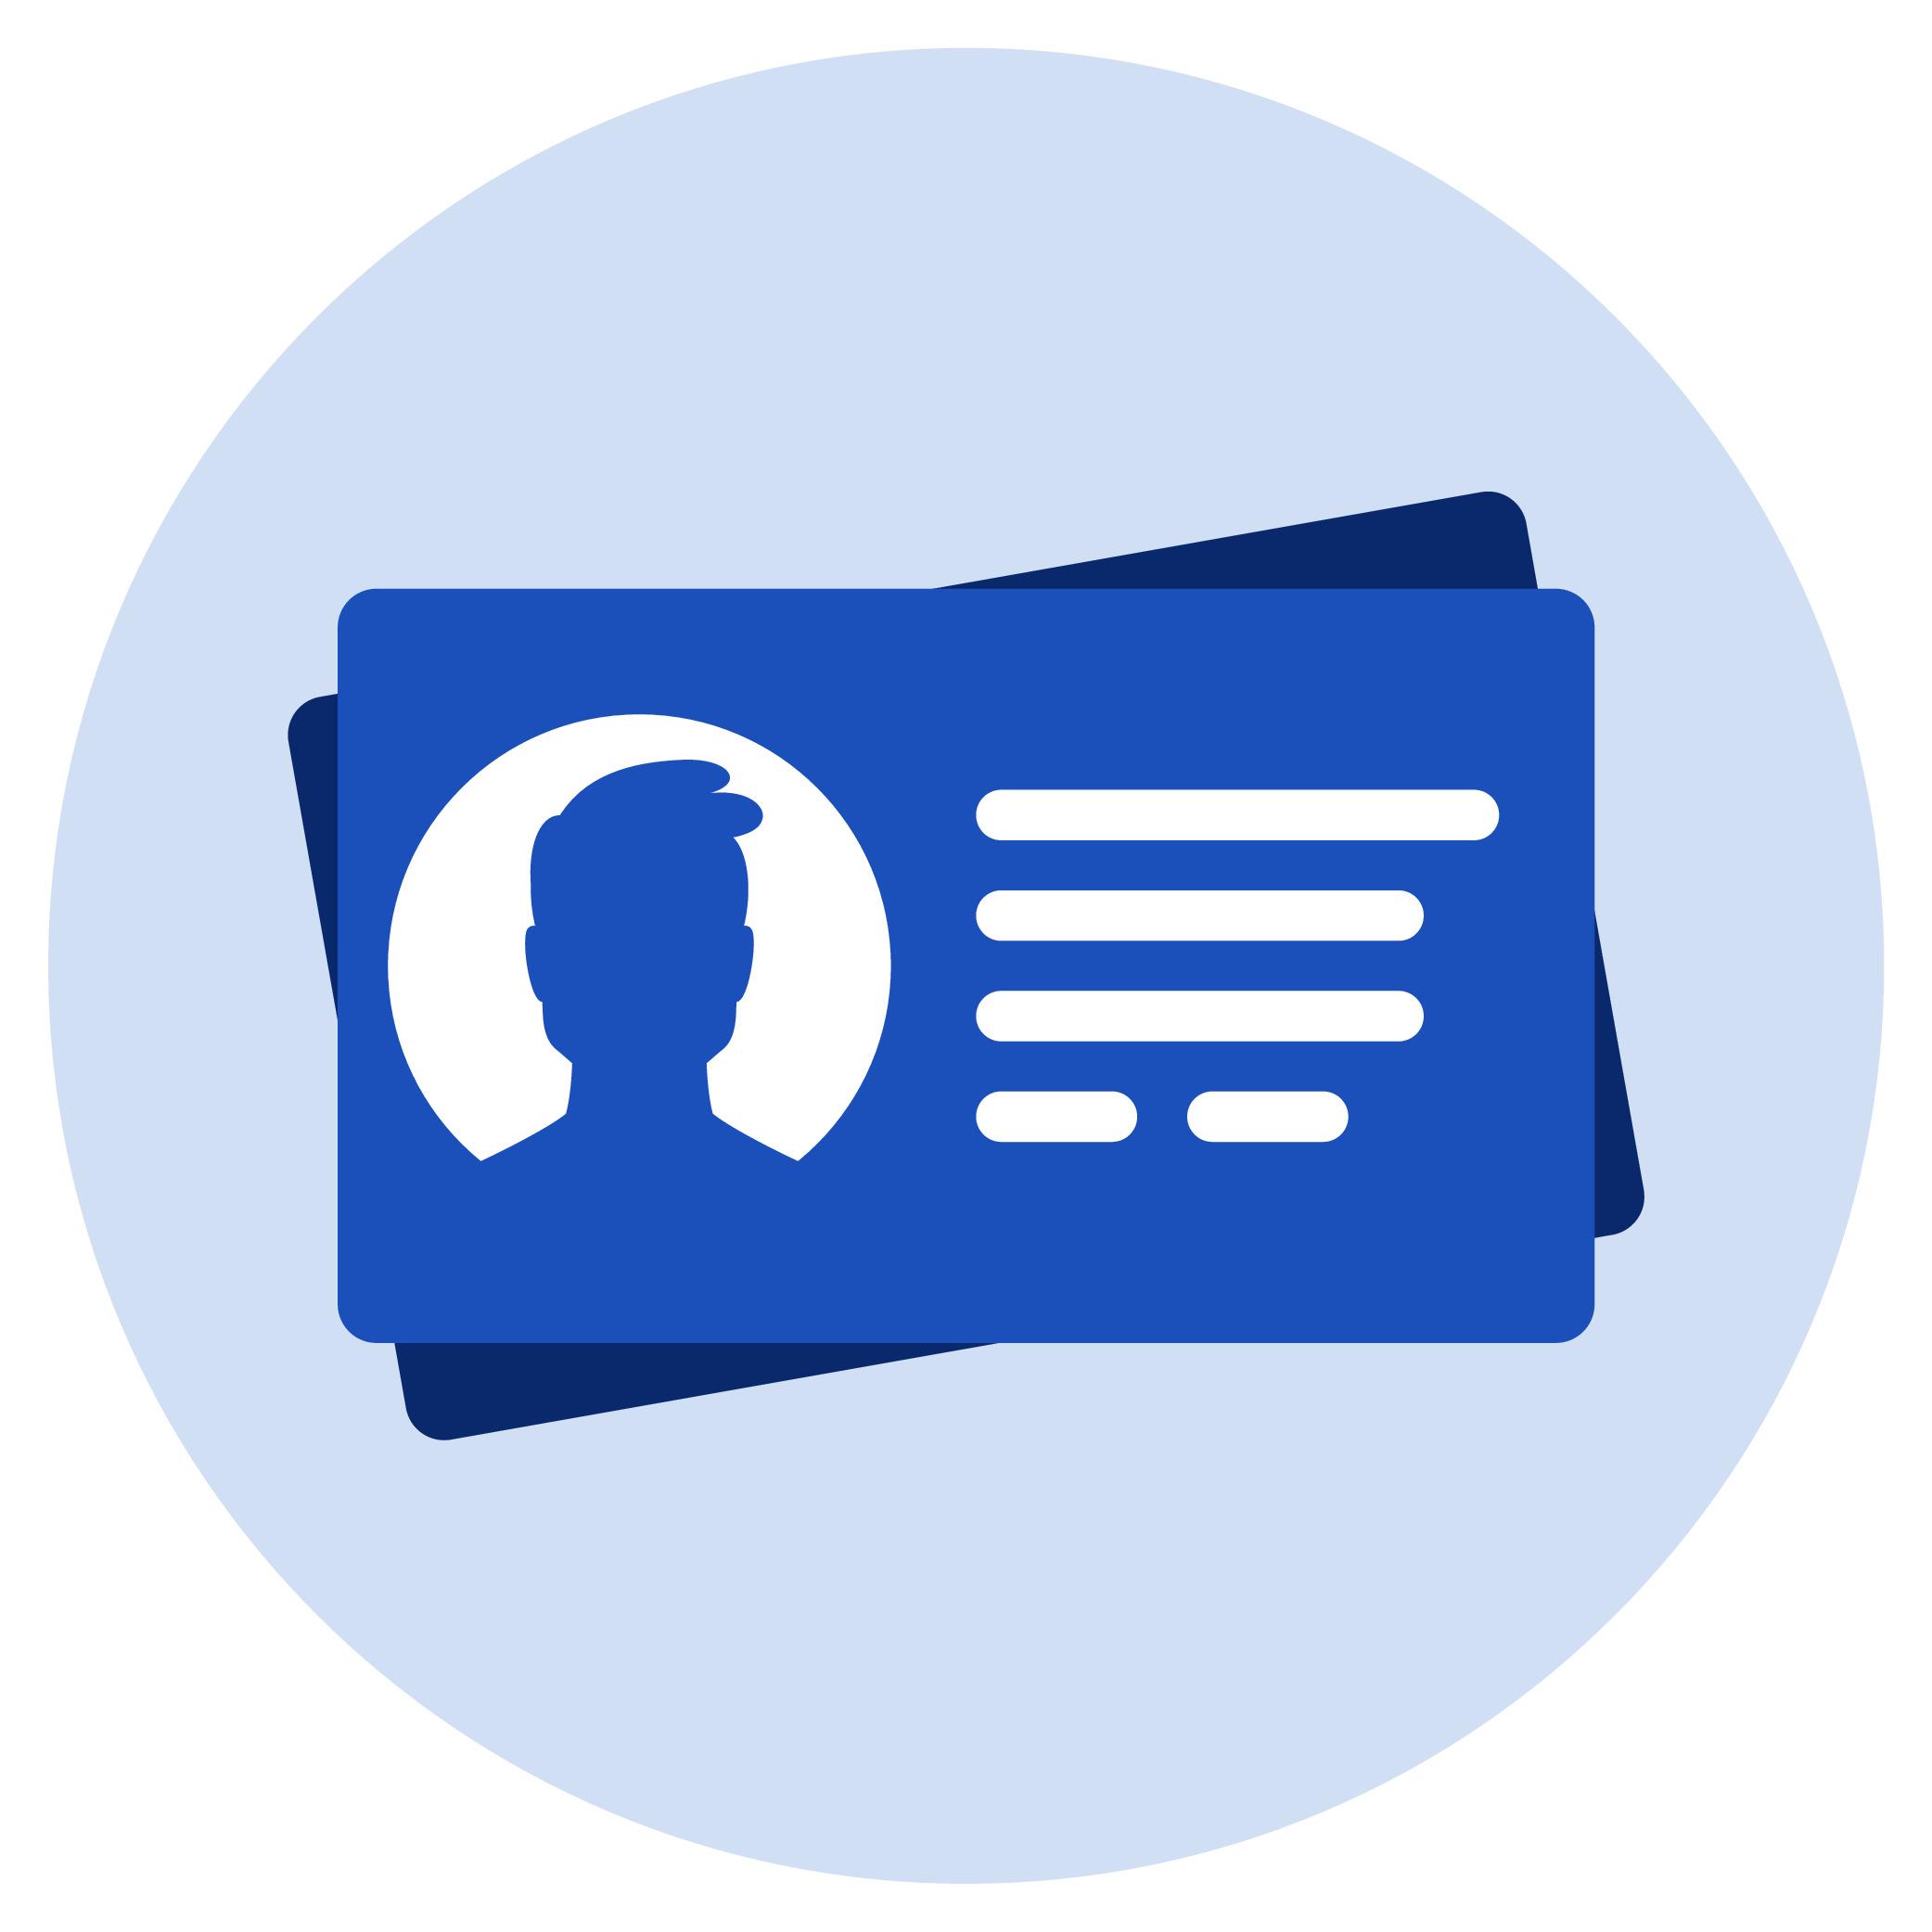 A valid ID card